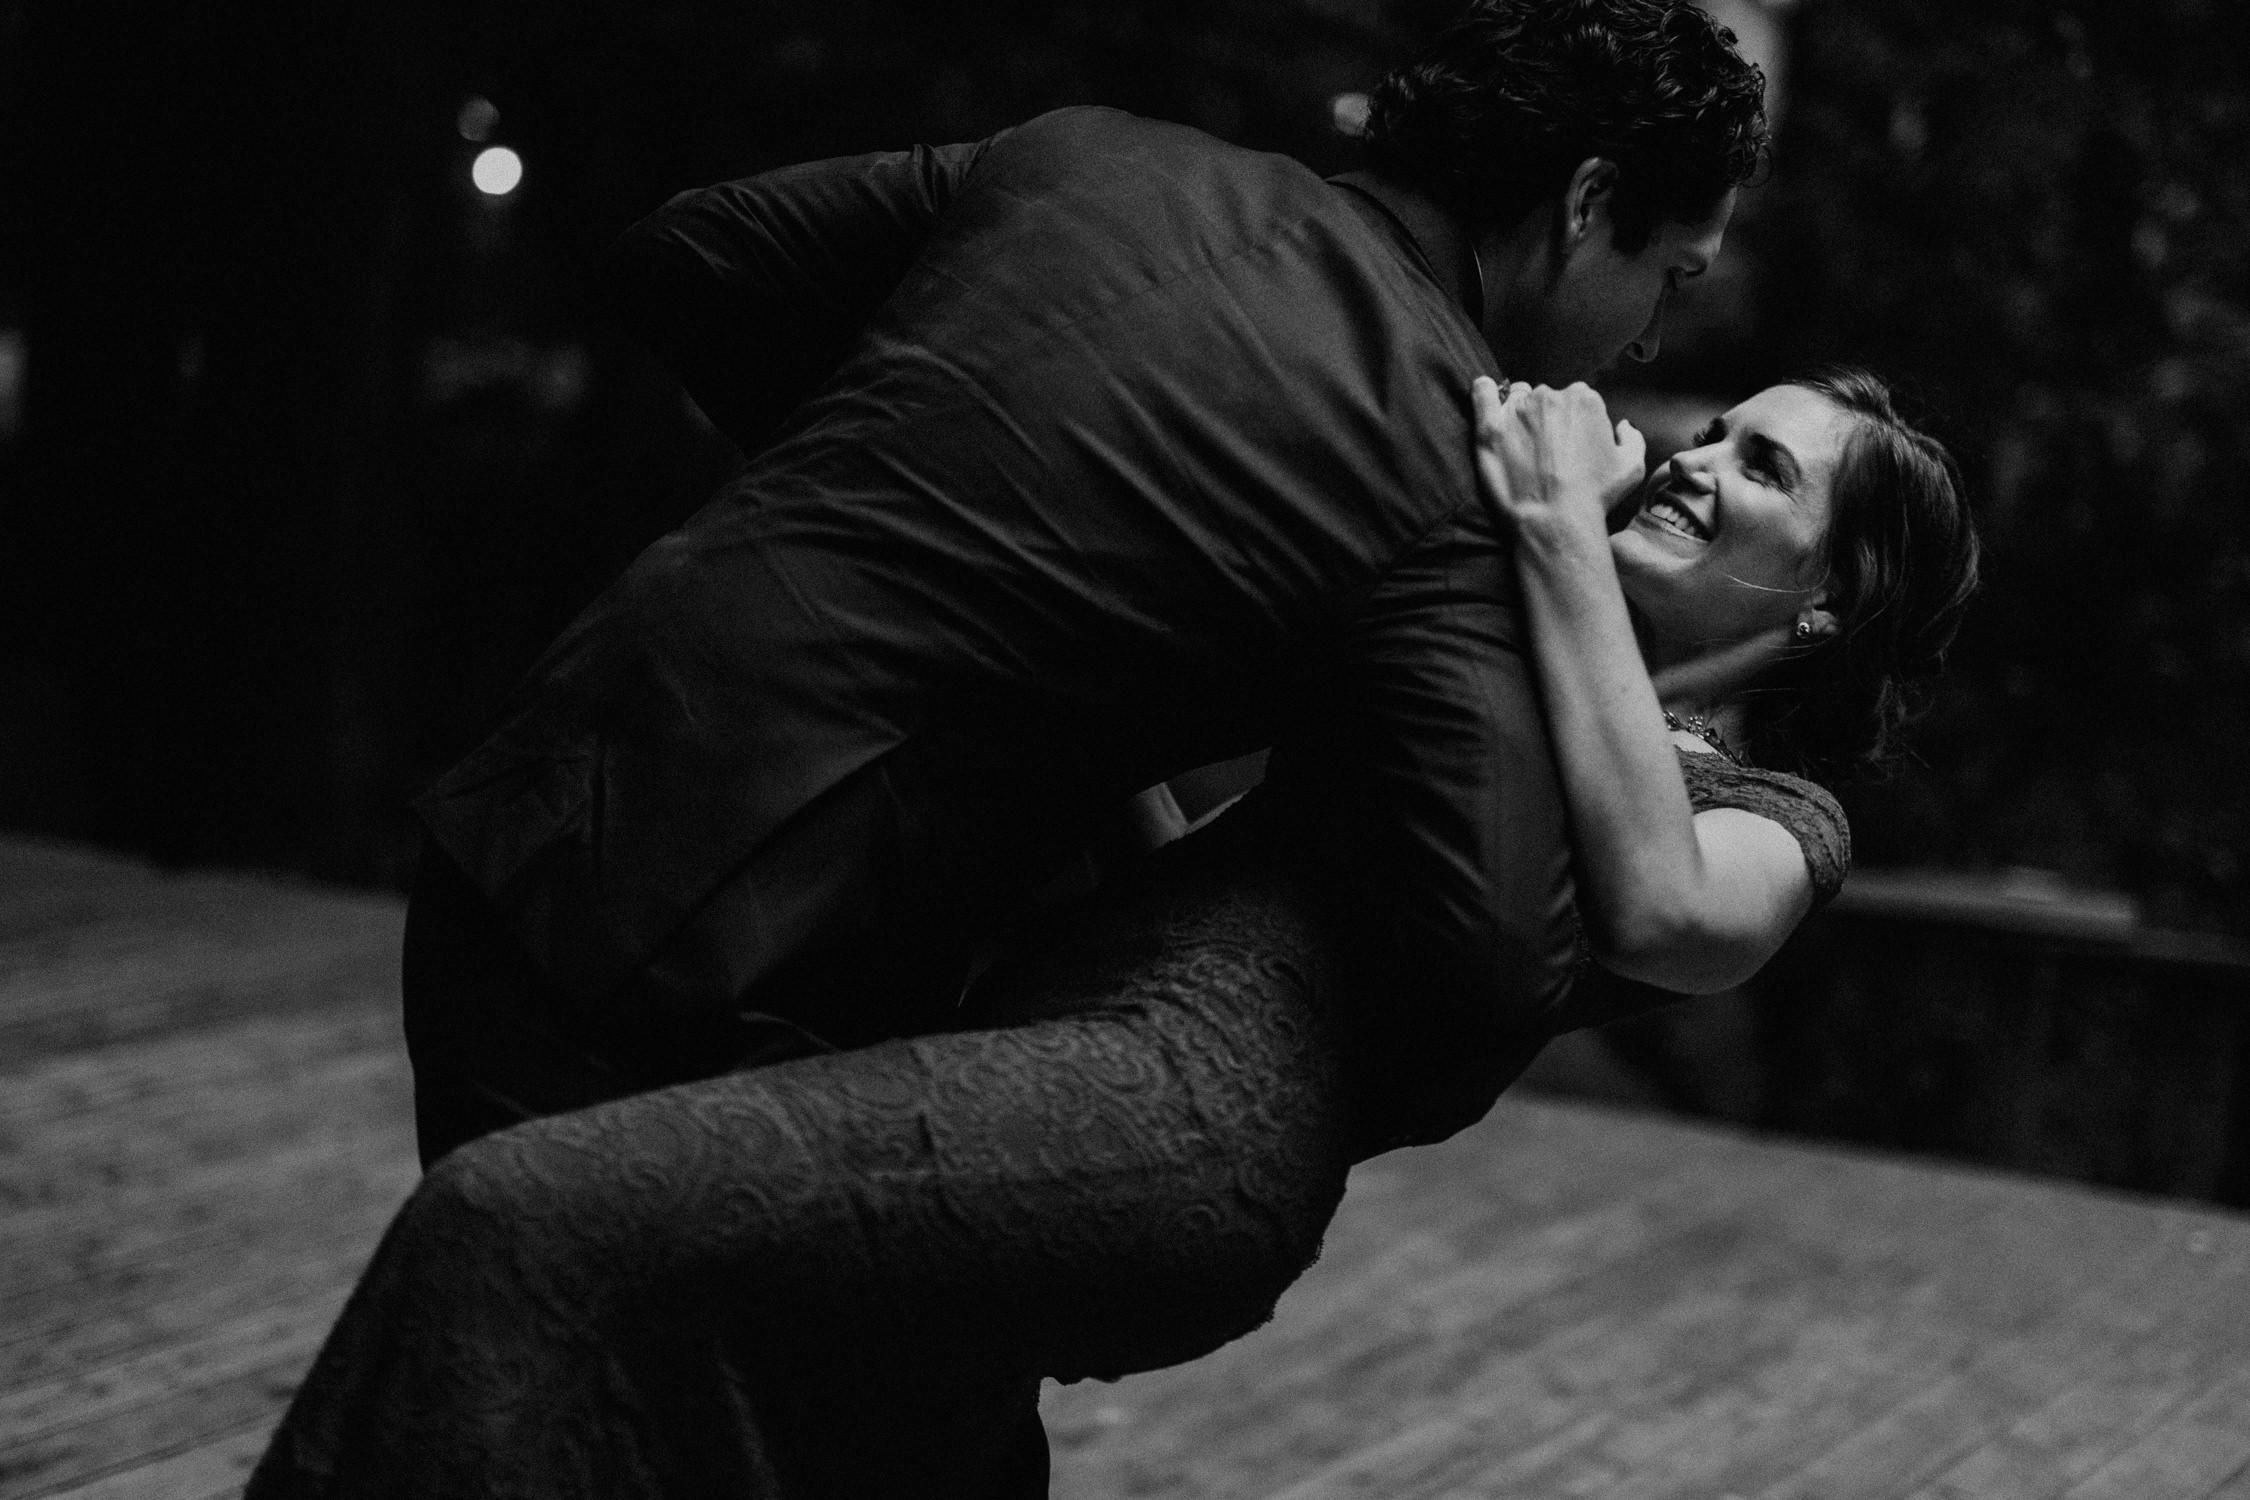 couple-intimate-engagement-session-mt-tam-61.jpg